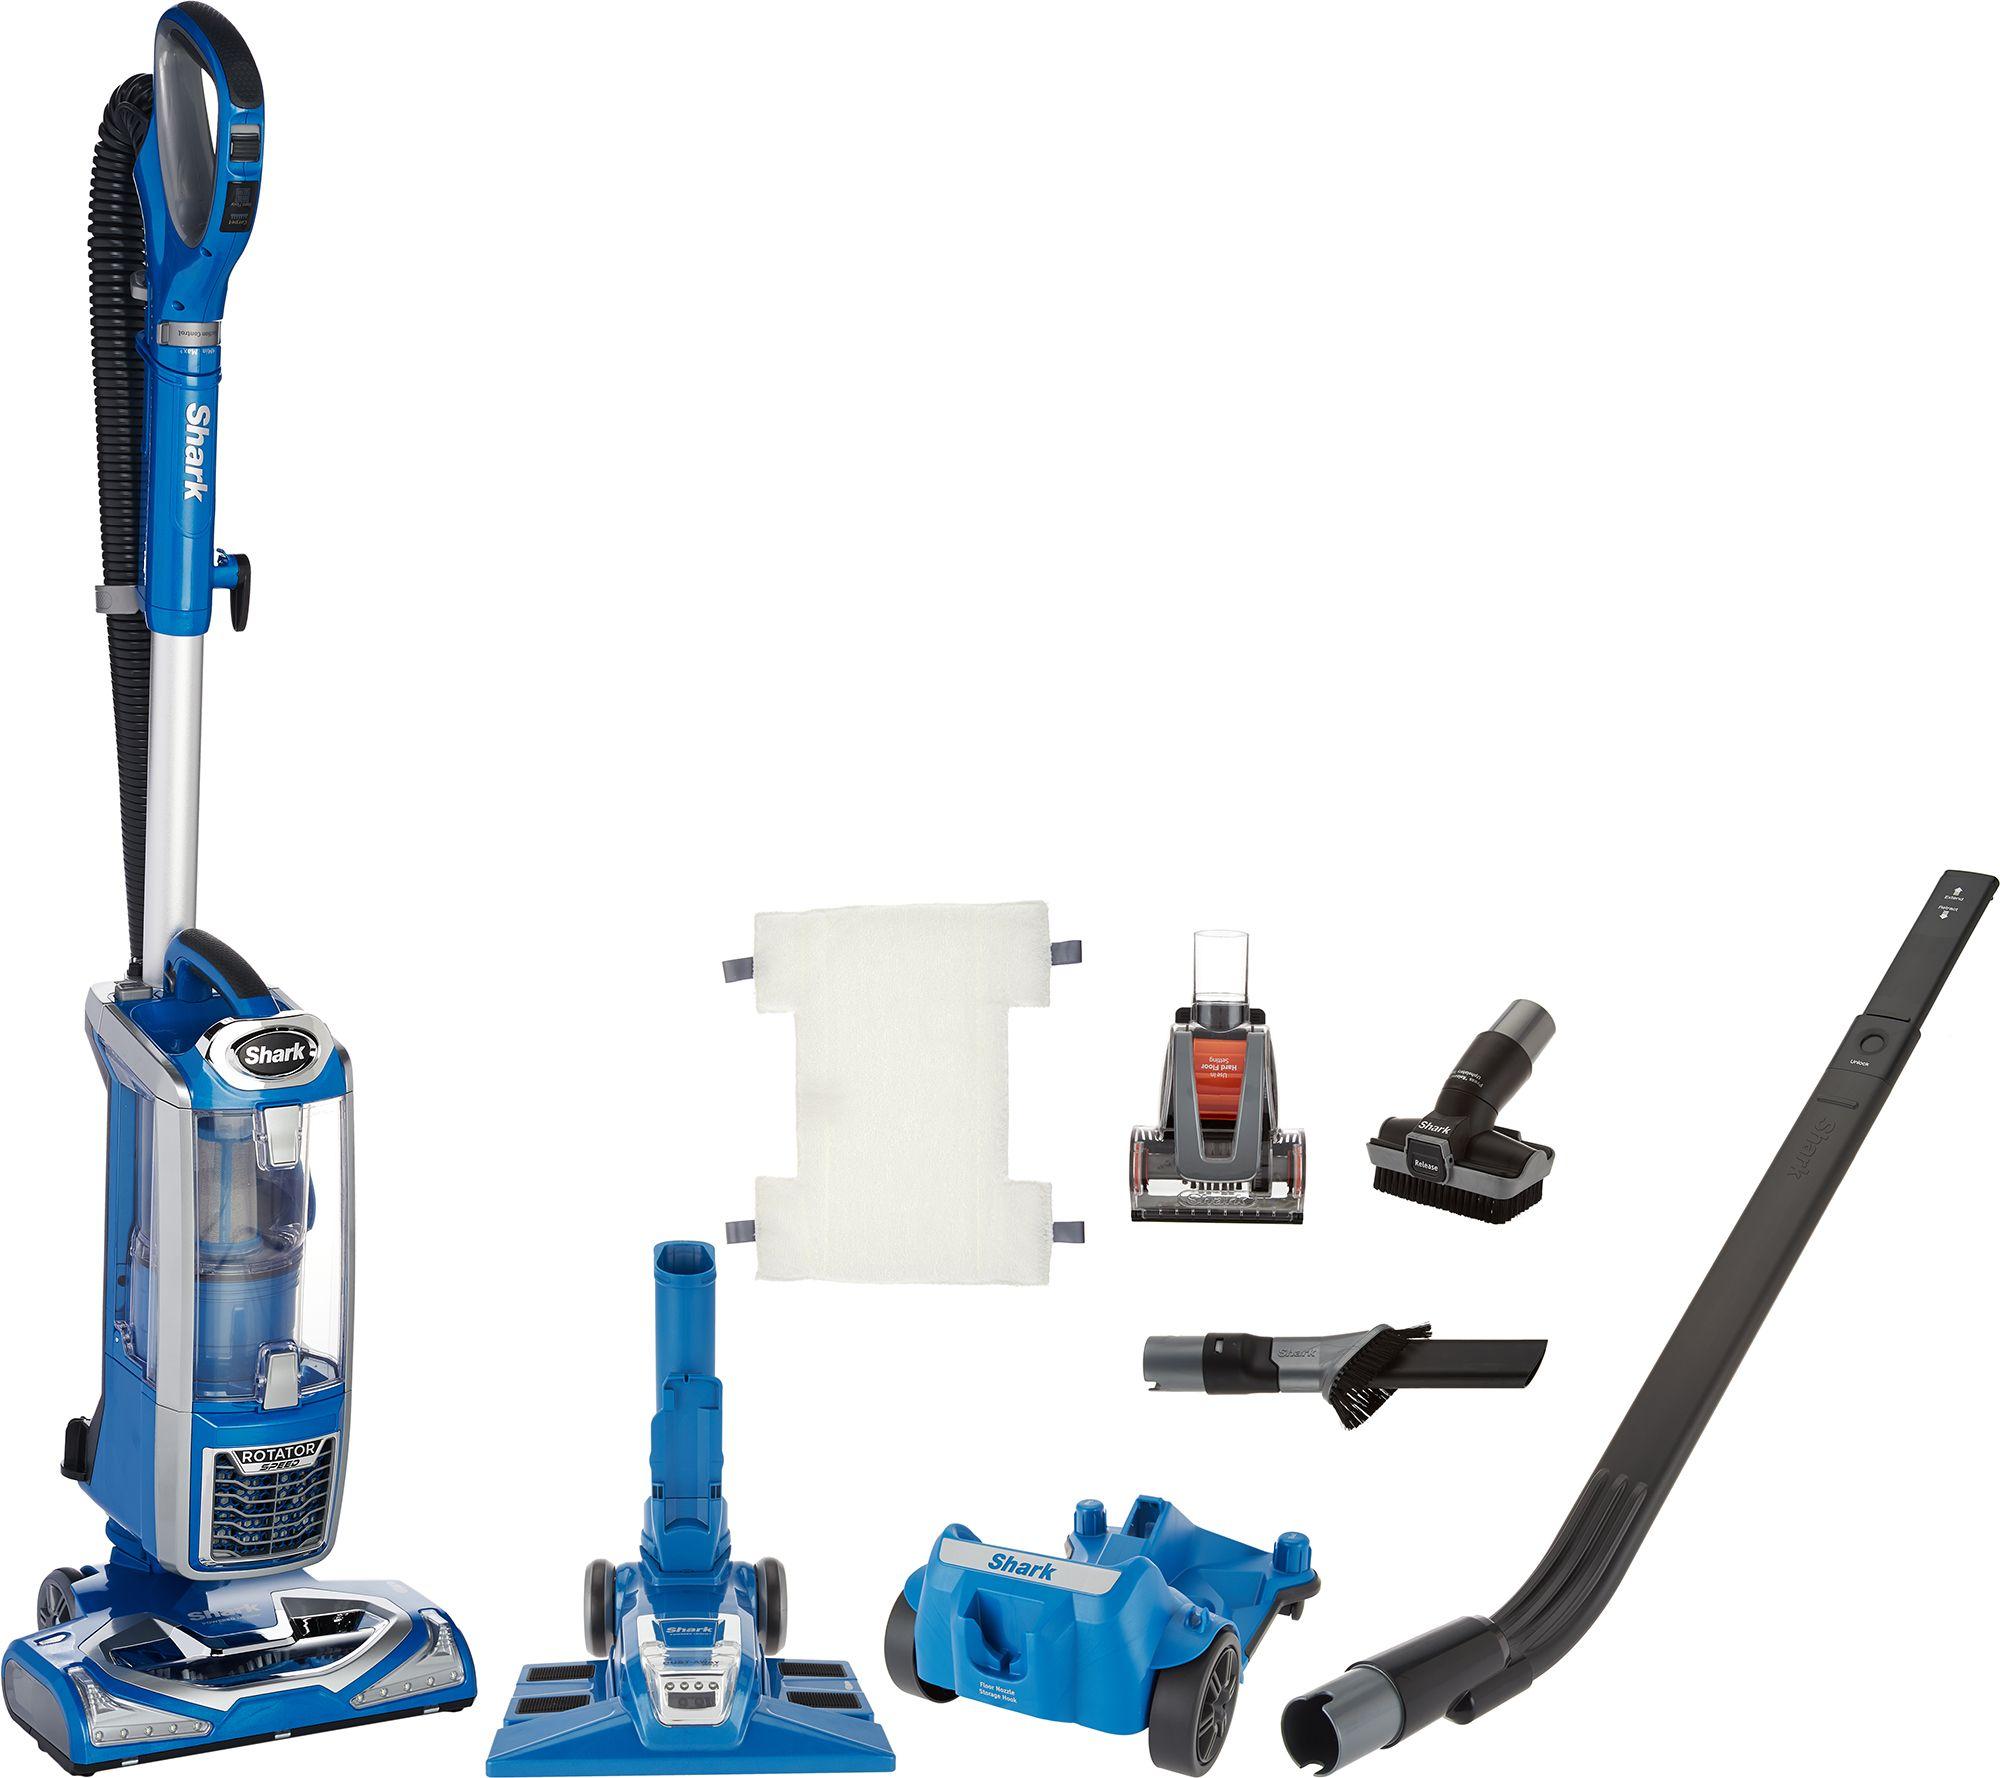 Shark navigator vacuum cleaner big w - Shark Navigator Vacuum Cleaner Big W 43